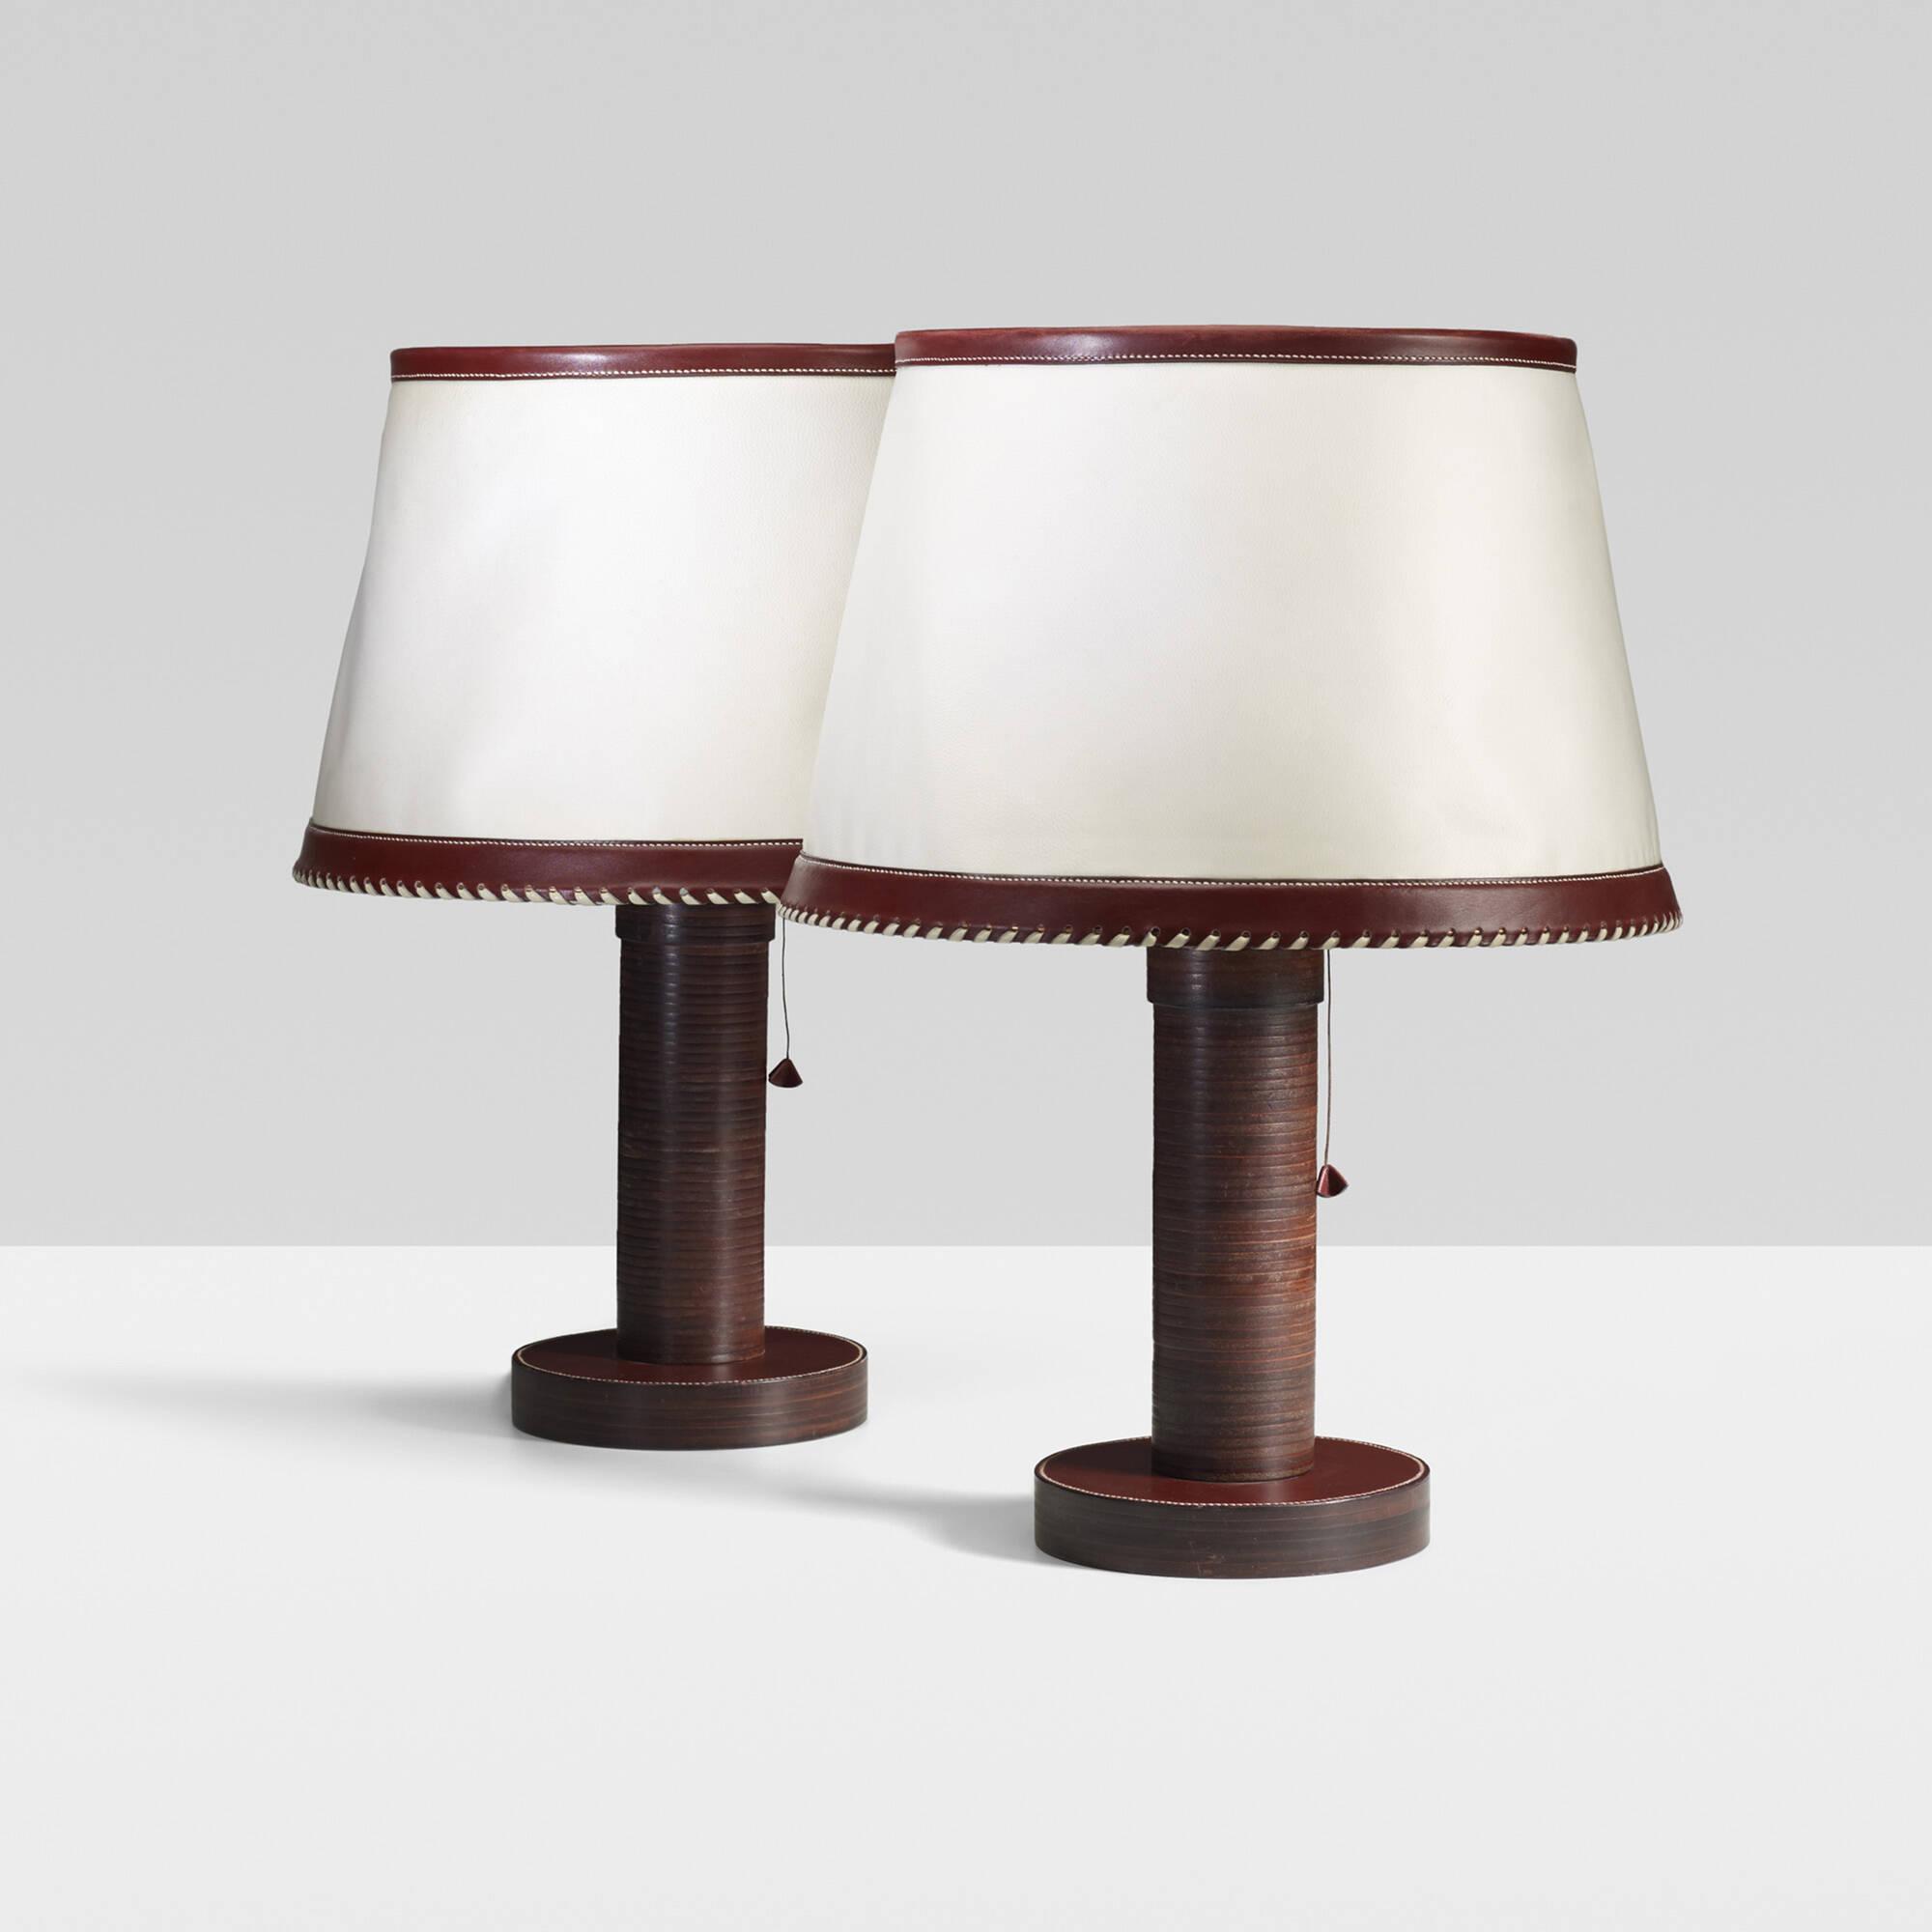 Enjoyable 284 Paul Dupre Lafon Table Lamps Pair Important Design Home Interior And Landscaping Mentranervesignezvosmurscom